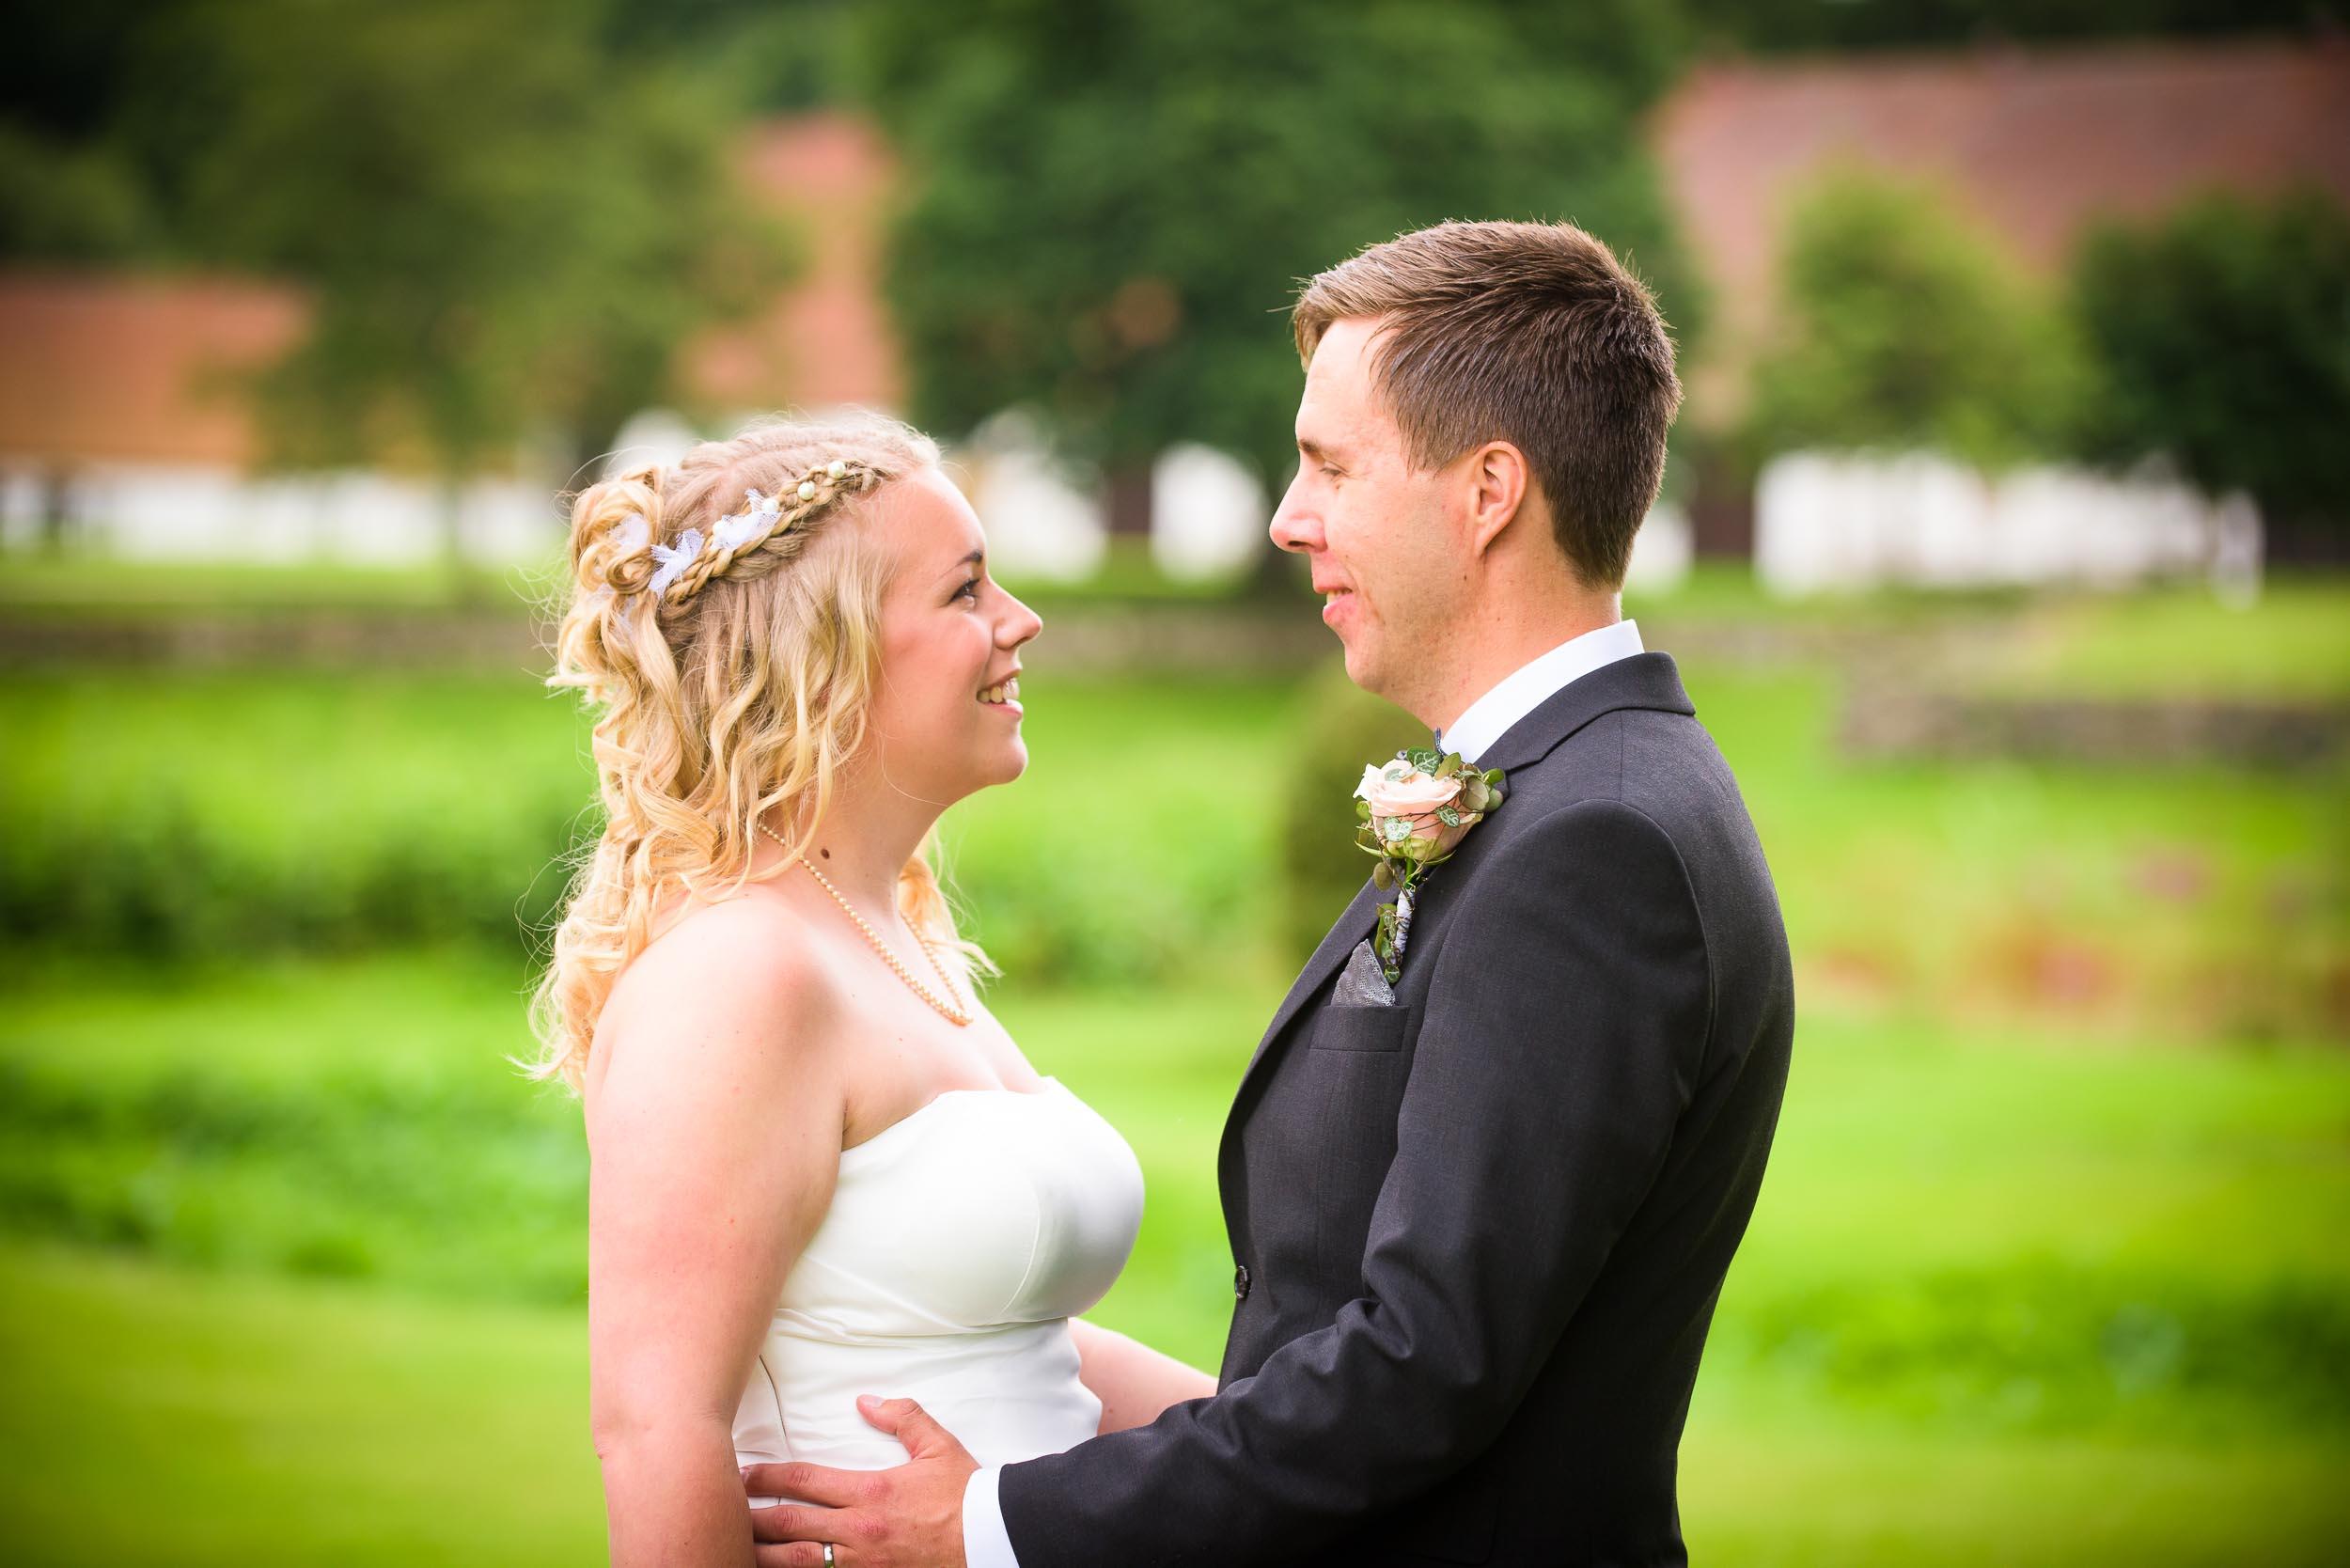 bröllopsfoto-tyringe-aug17-1.jpg